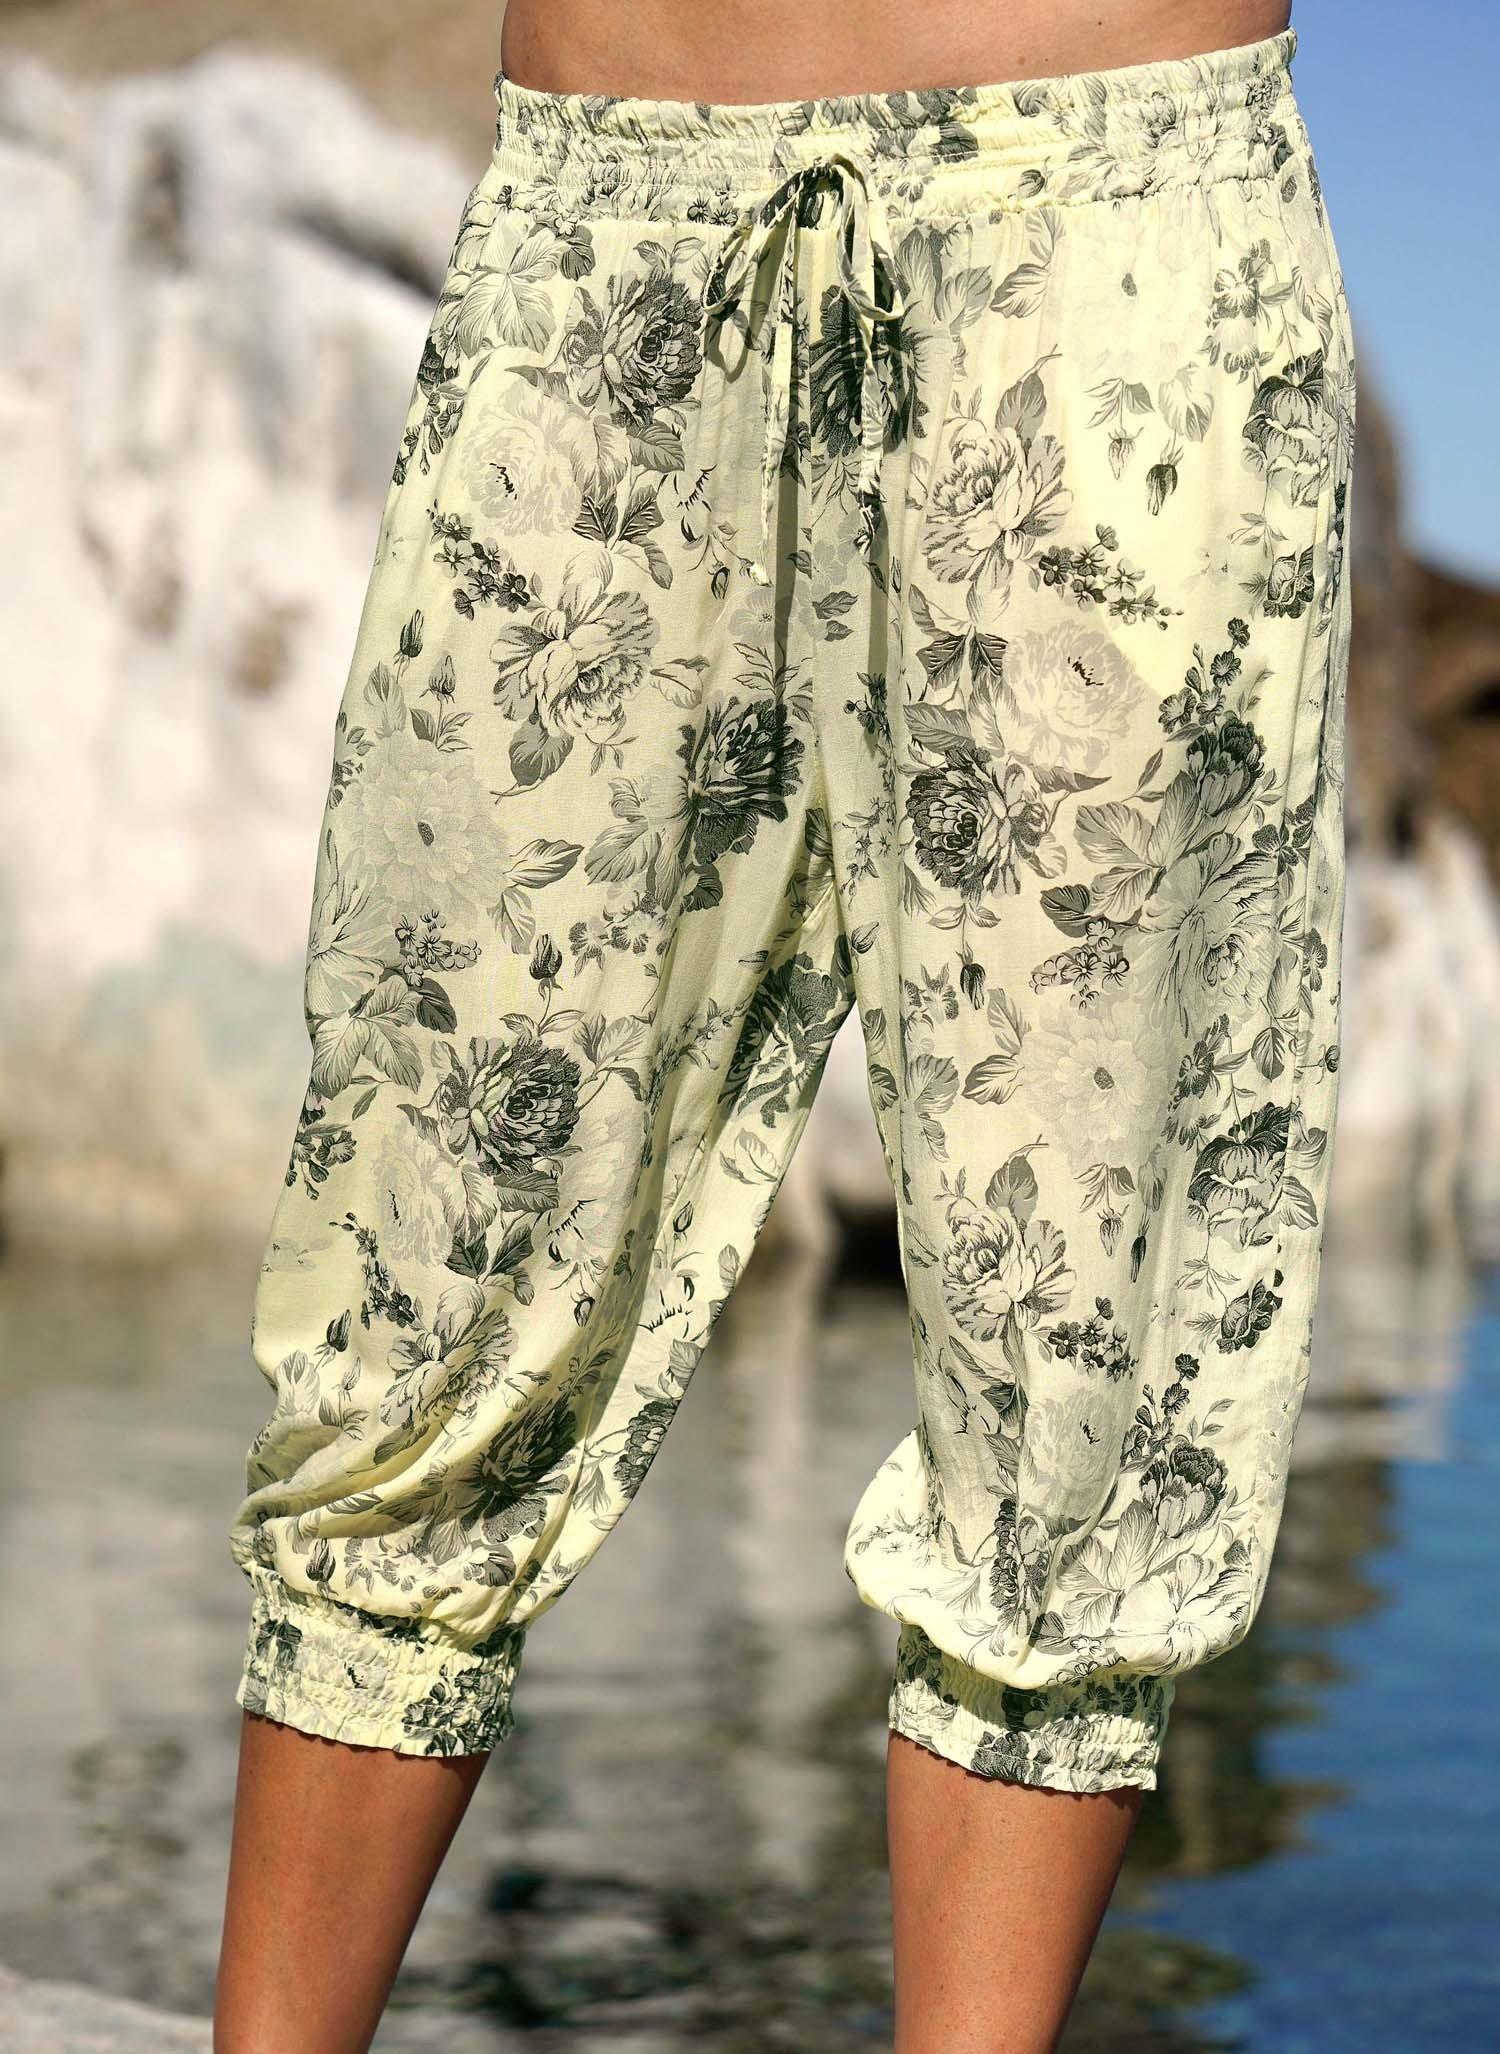 D-Capri-Hose,Floral-Print gelb L 015 - 1 - Ronja.ch